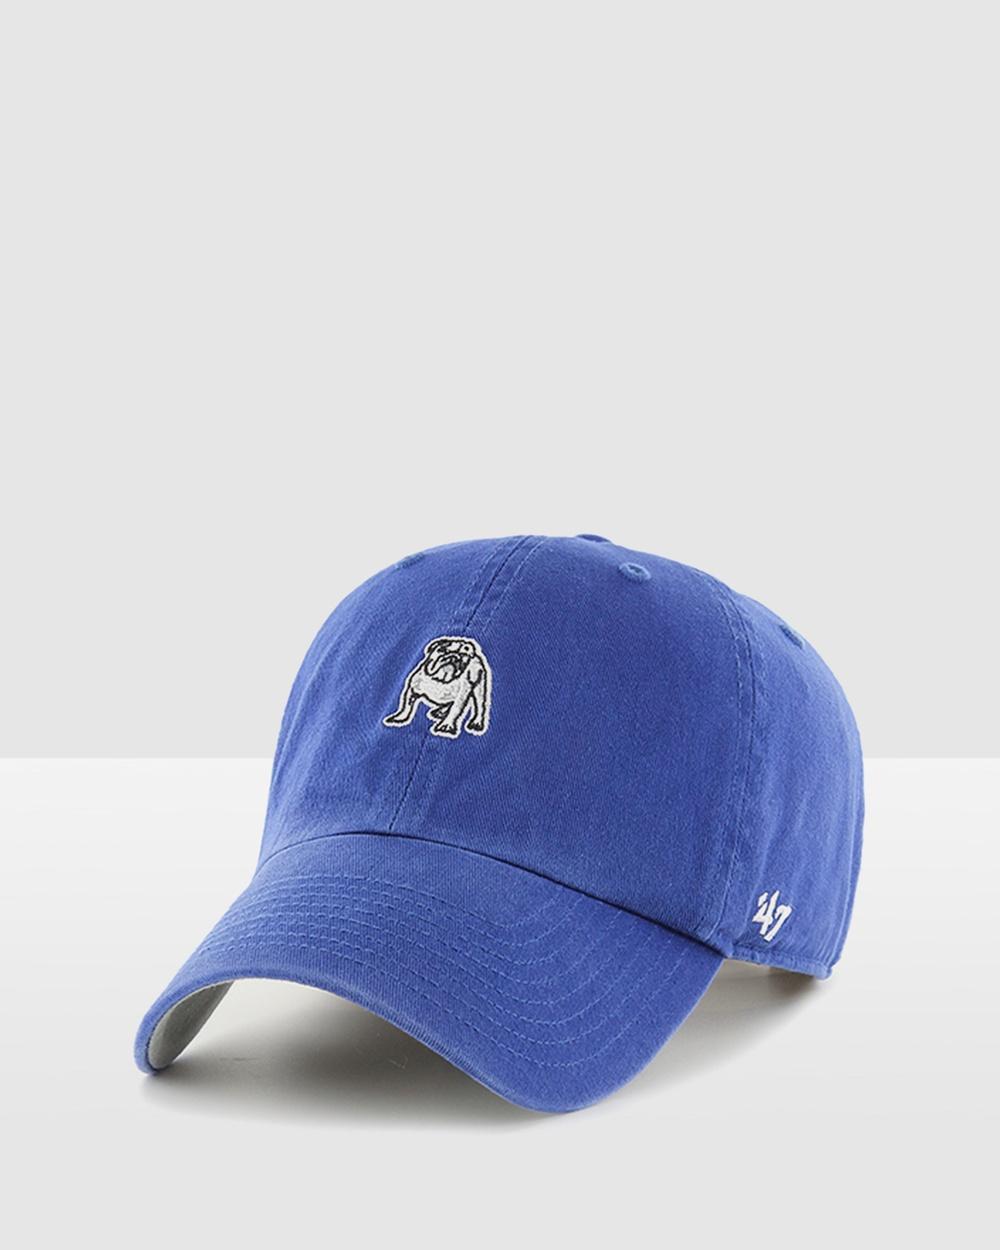 47 Bulldogs Base Runner '47 CLEAN UP Headwear blue